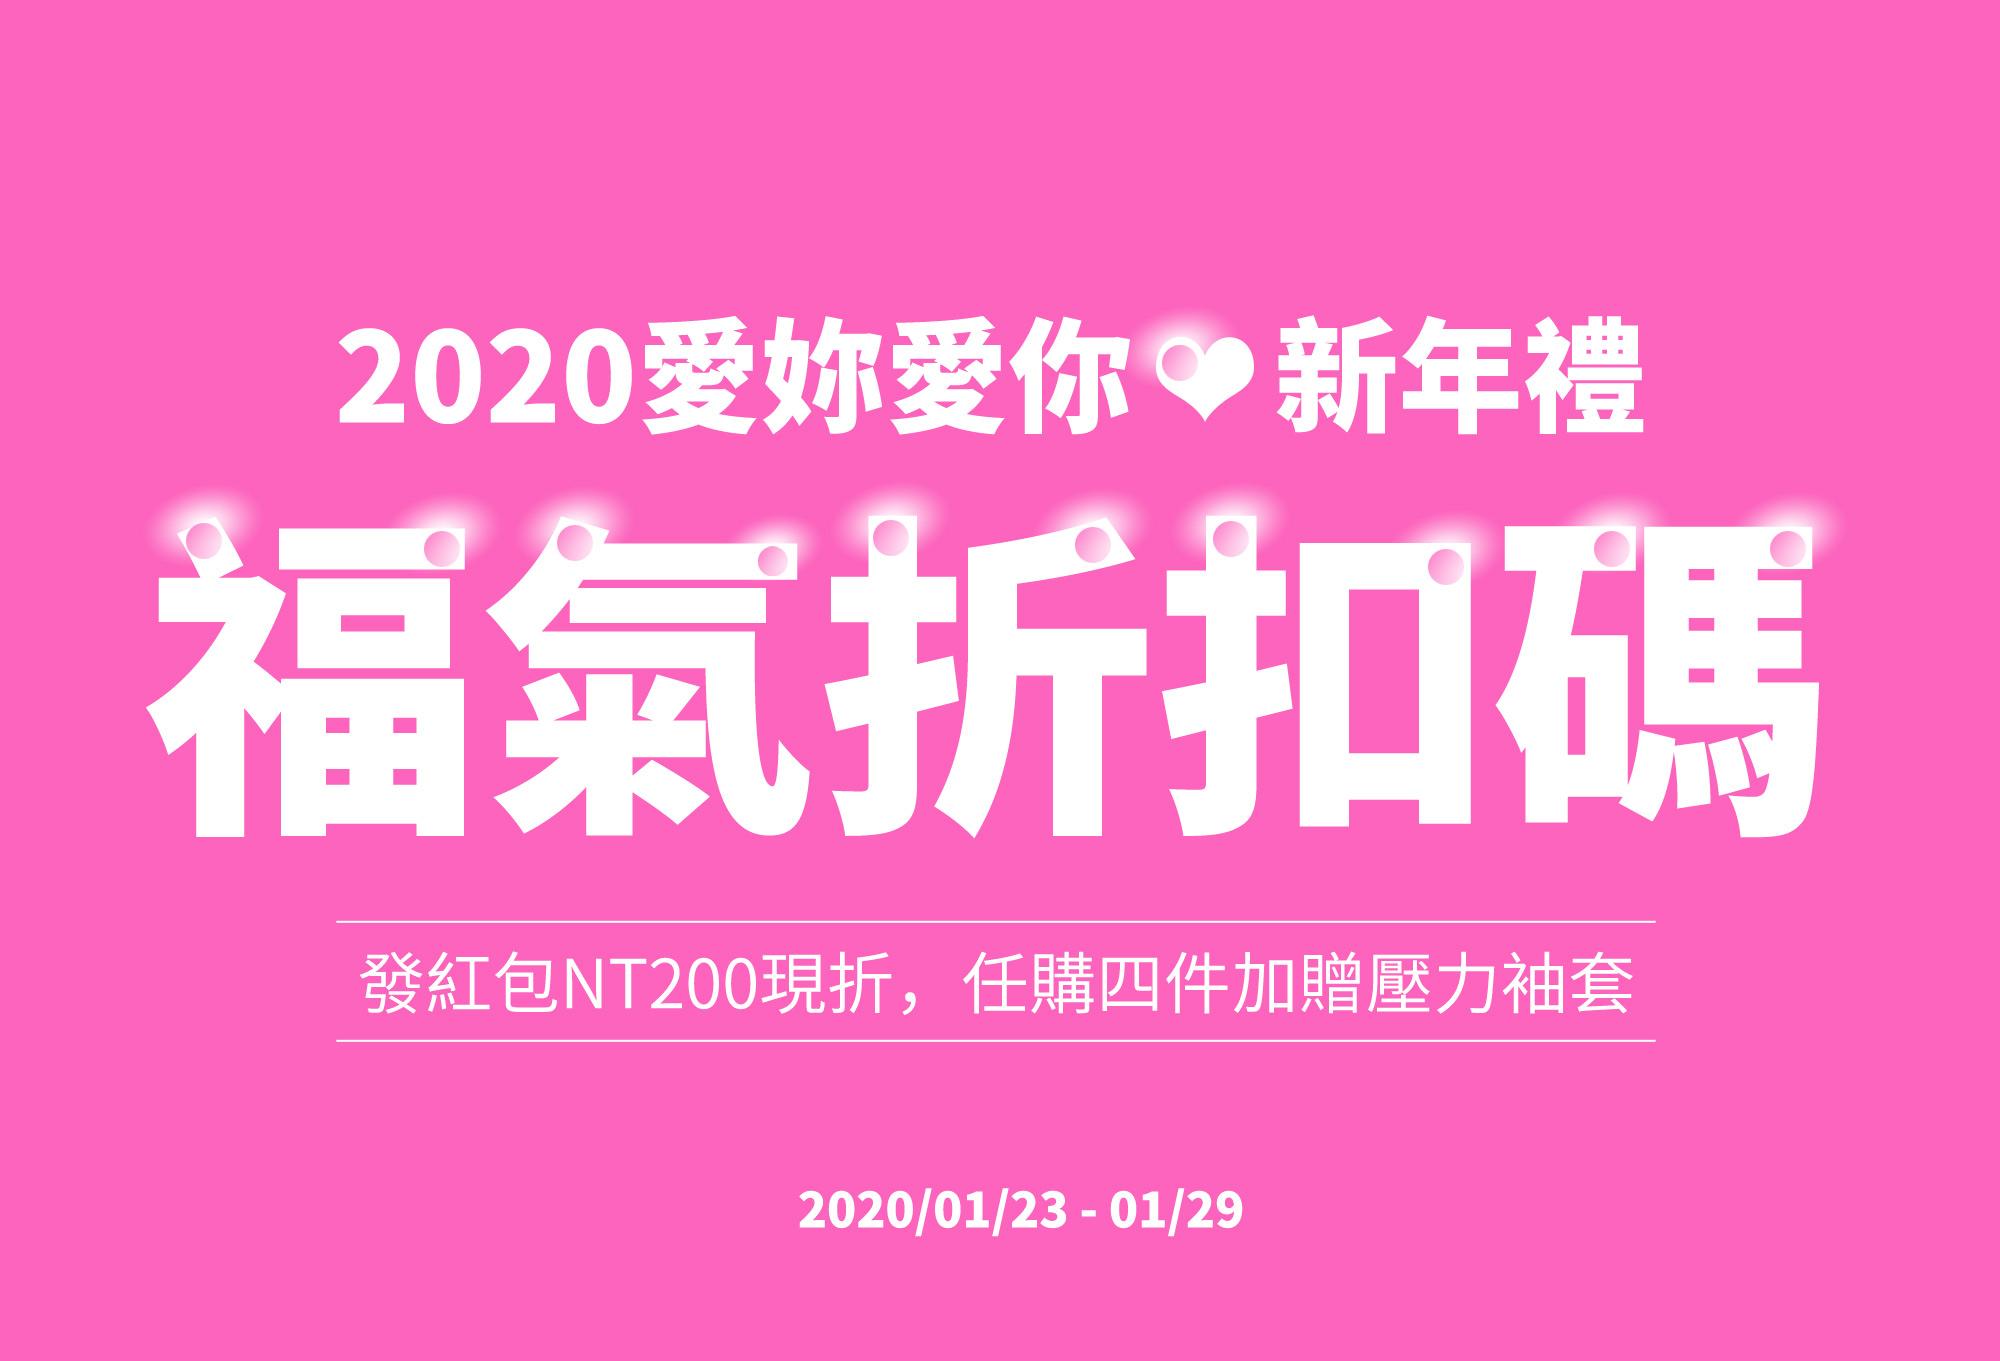 TXG會員限定折扣碼,取得NT200元現金折價!